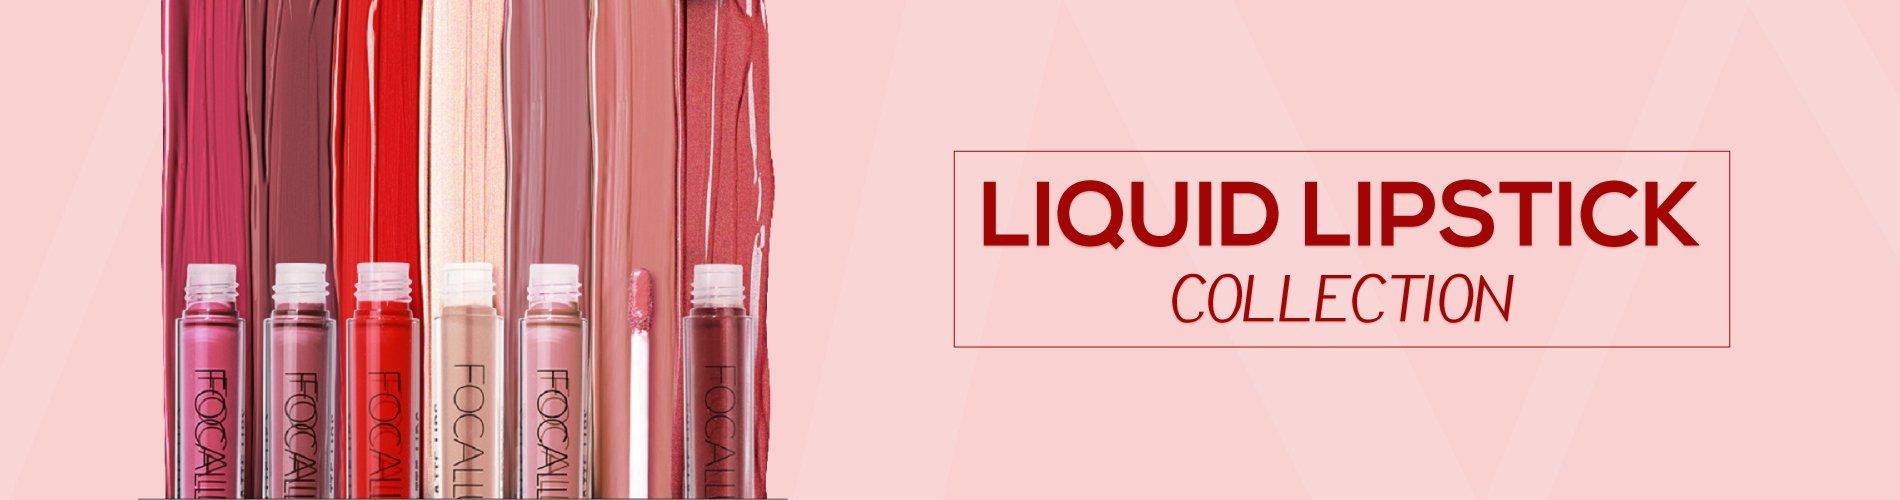 Liquid Lipstick Banner